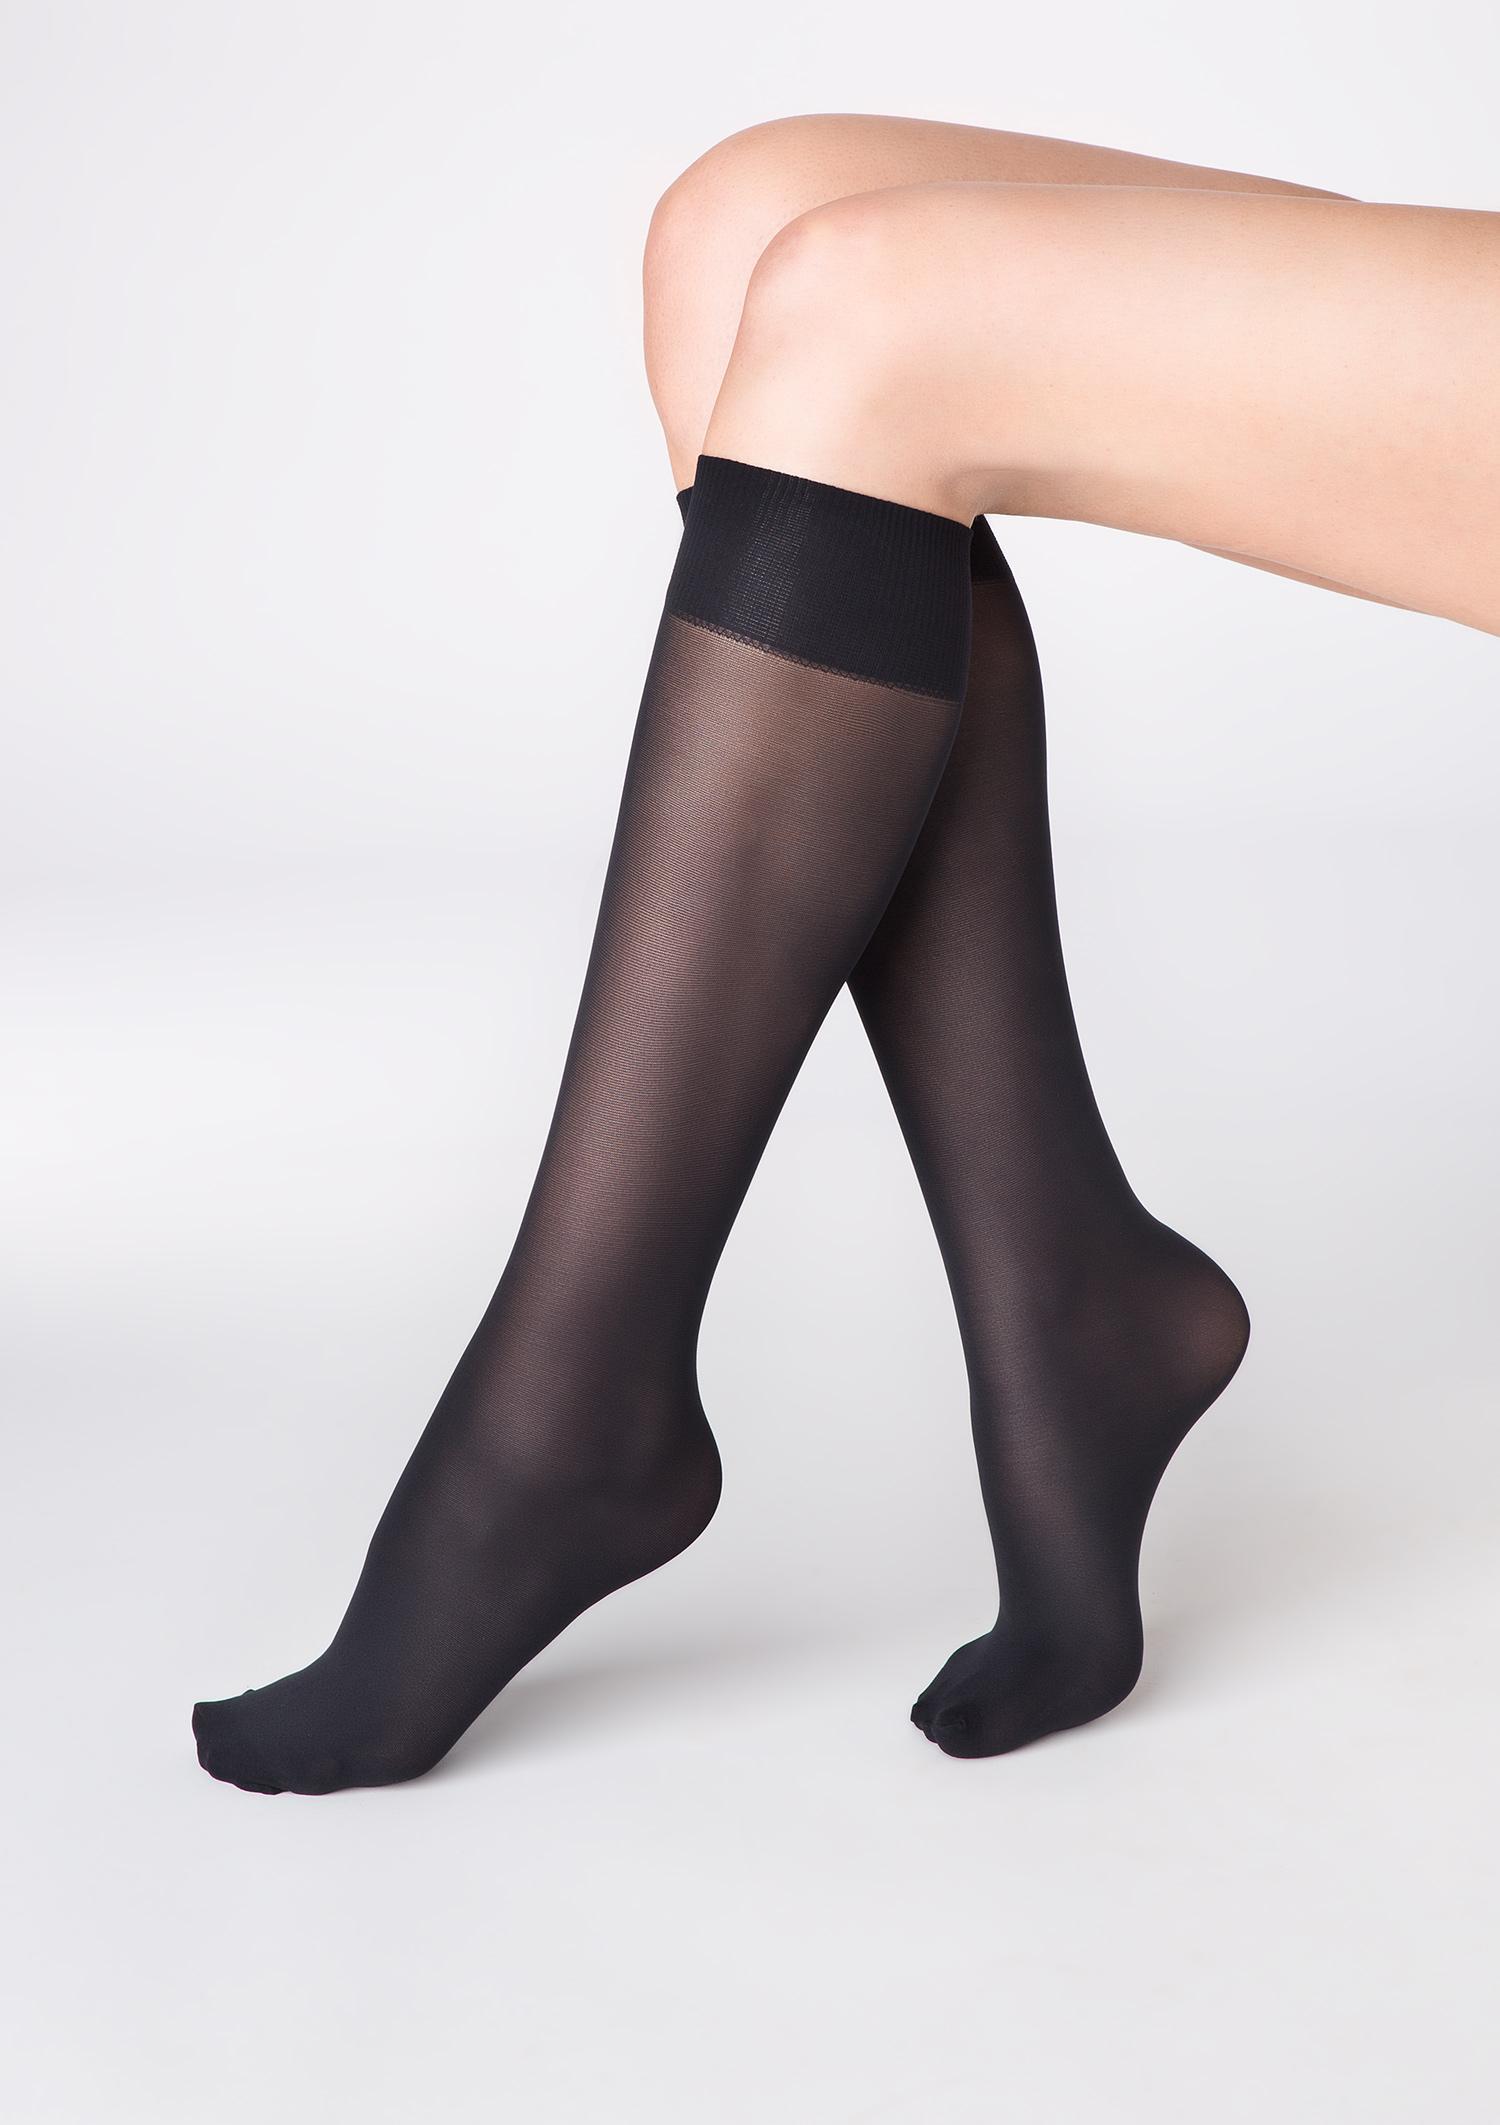 https://golden-legs.com.ua/images/stories/virtuemart/product/funny_nero.jpg